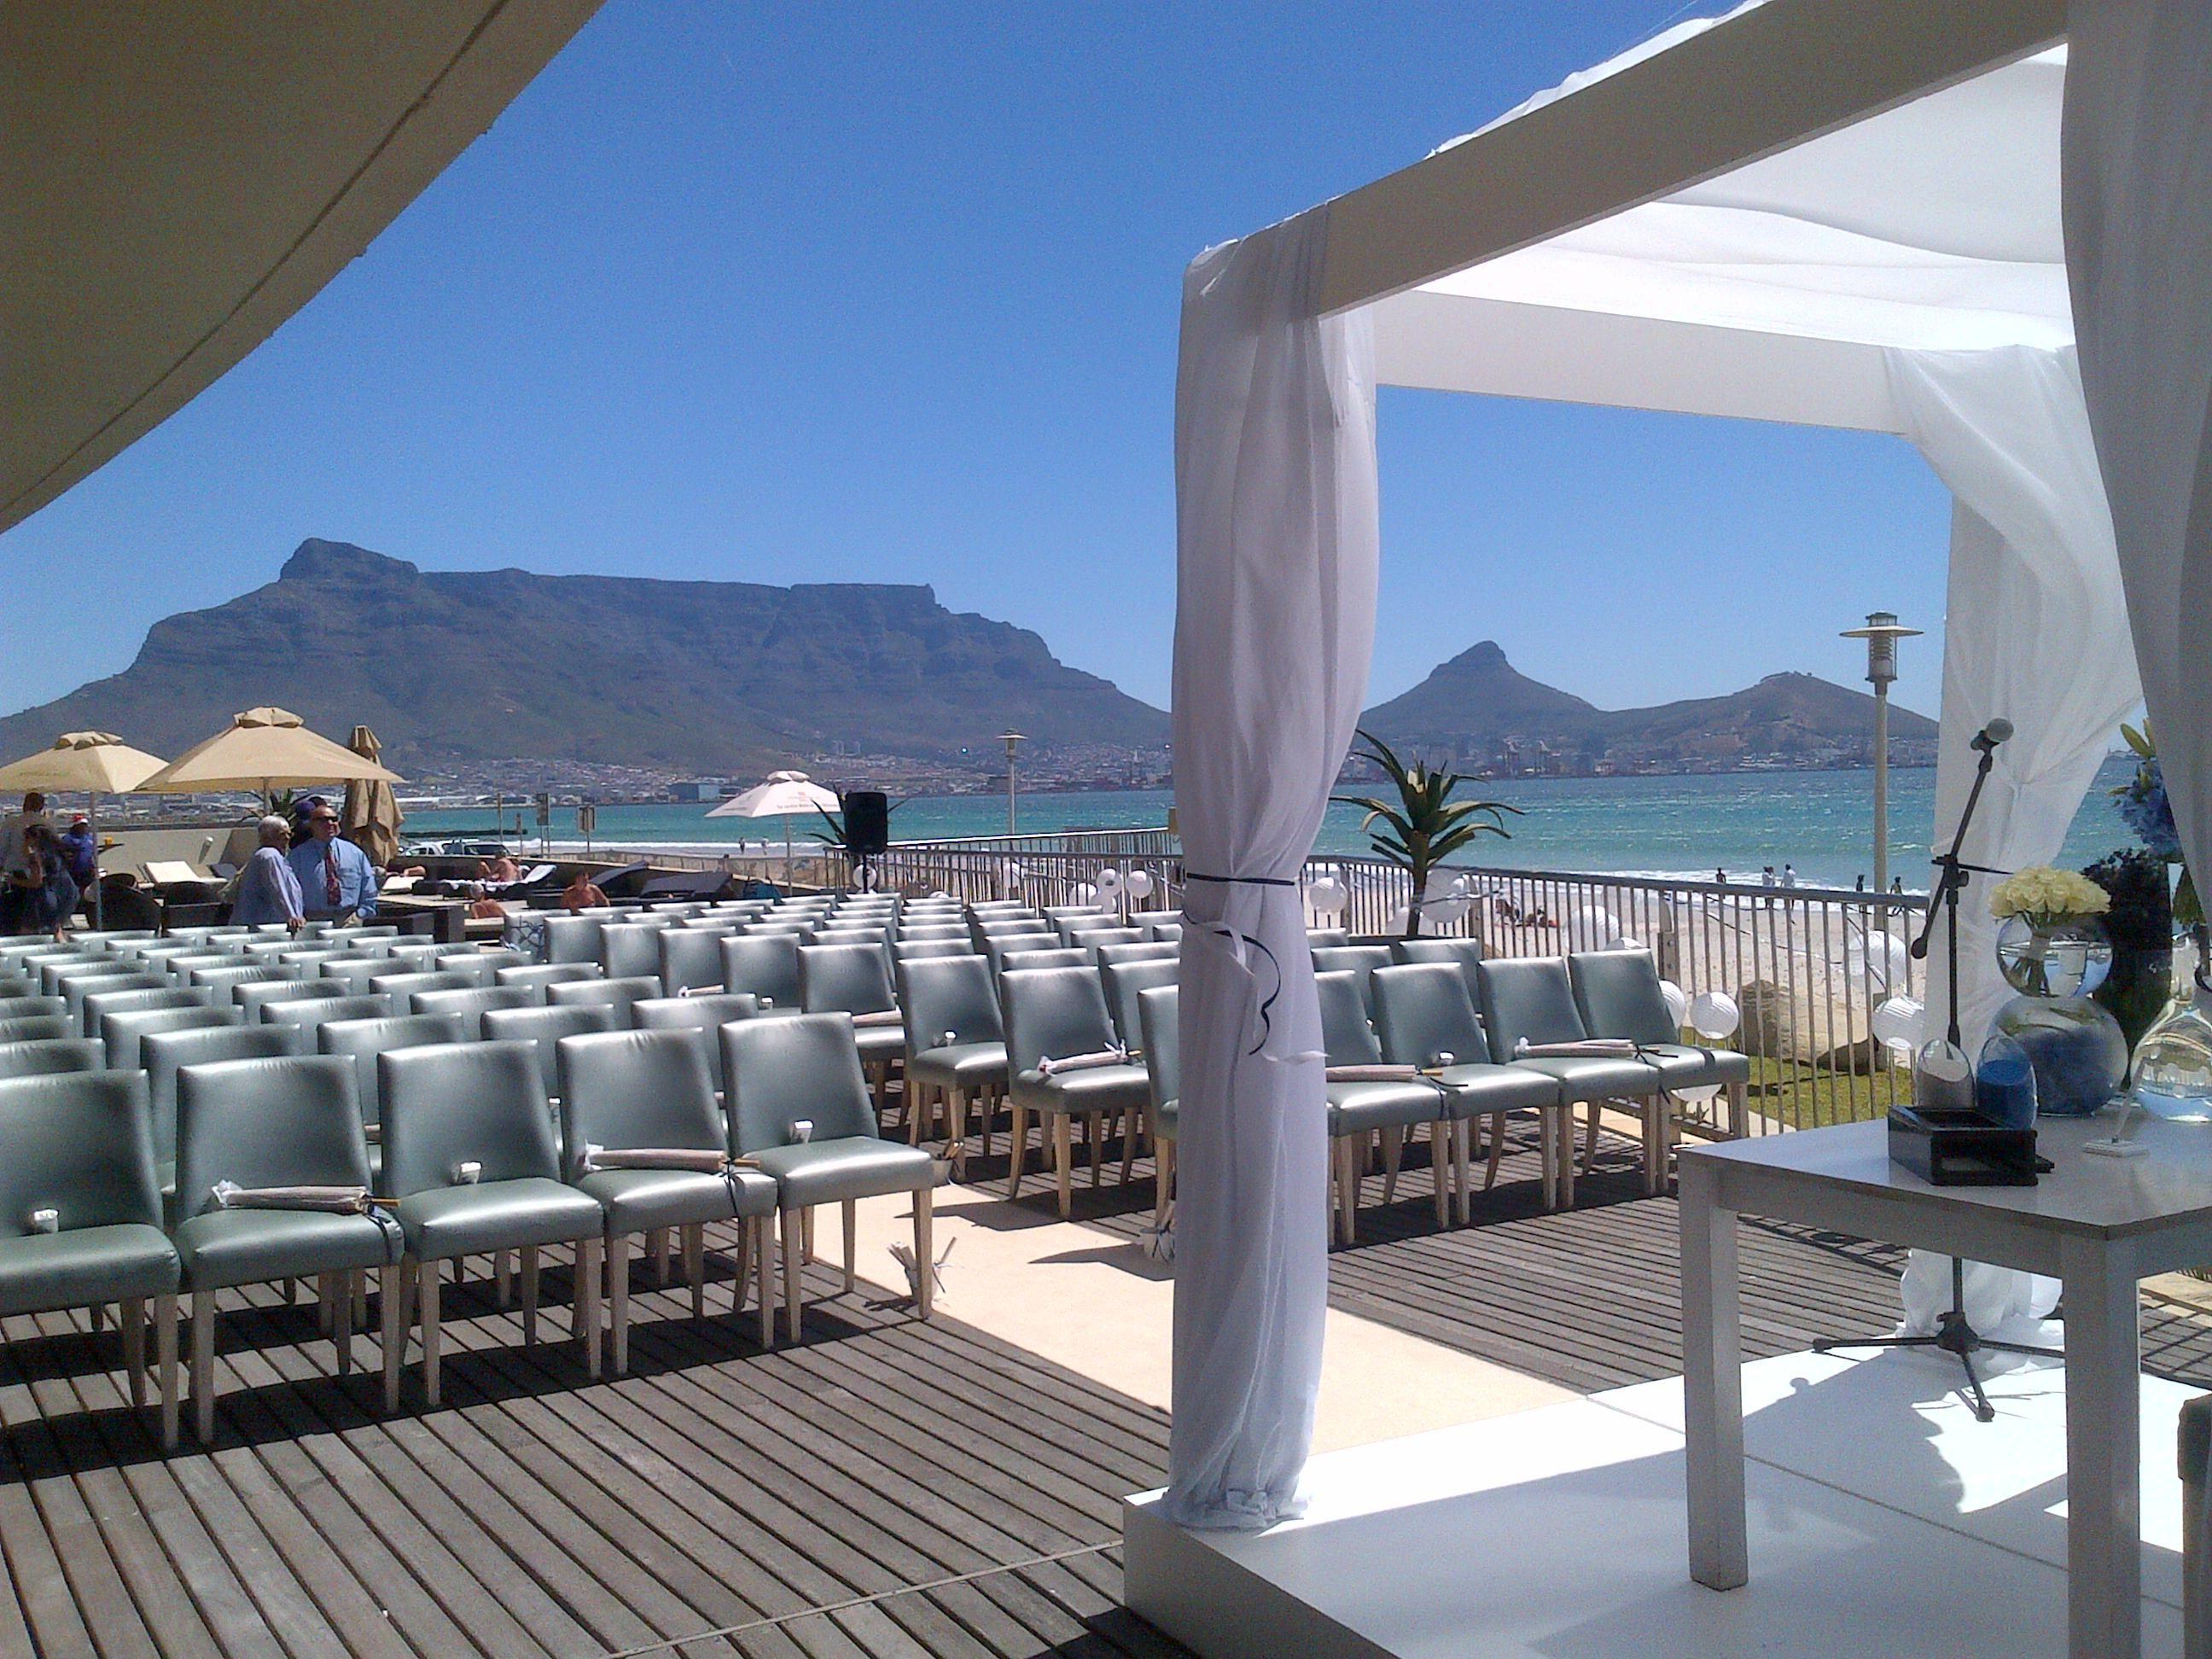 Beach Weddings At Lagoon Hotel